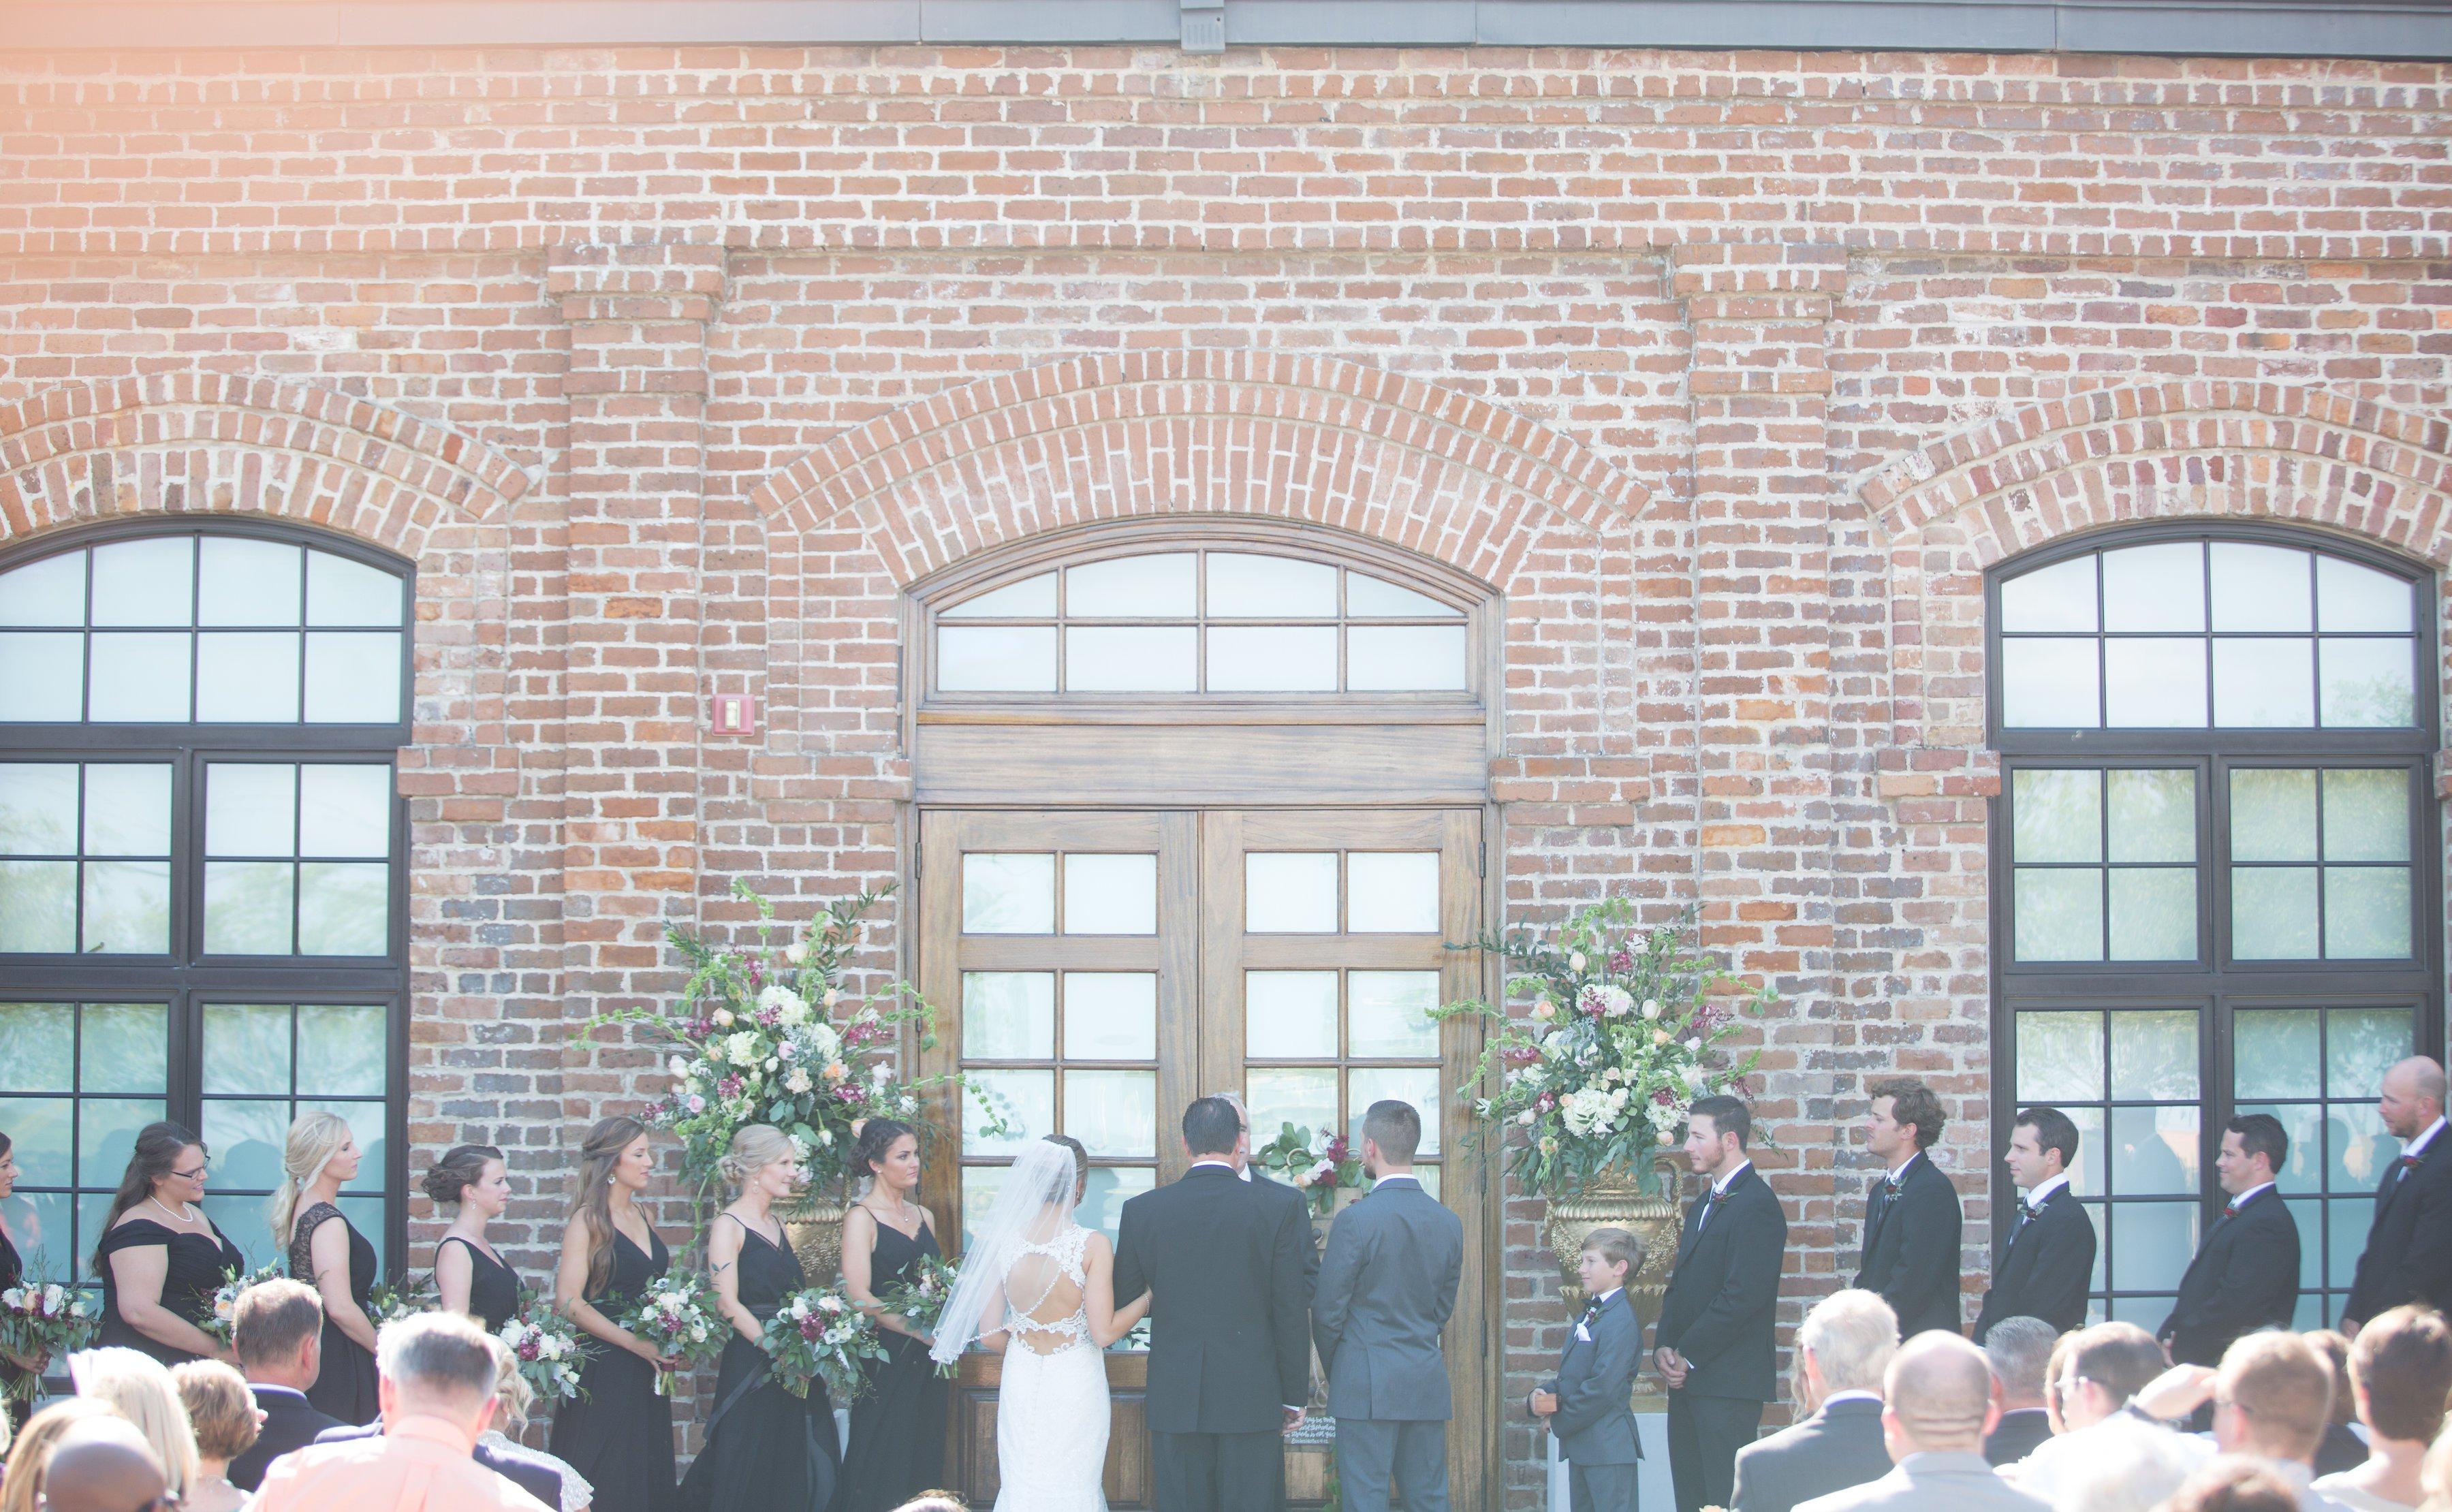 charles-morris-wedding-photo-mg(570).jpg